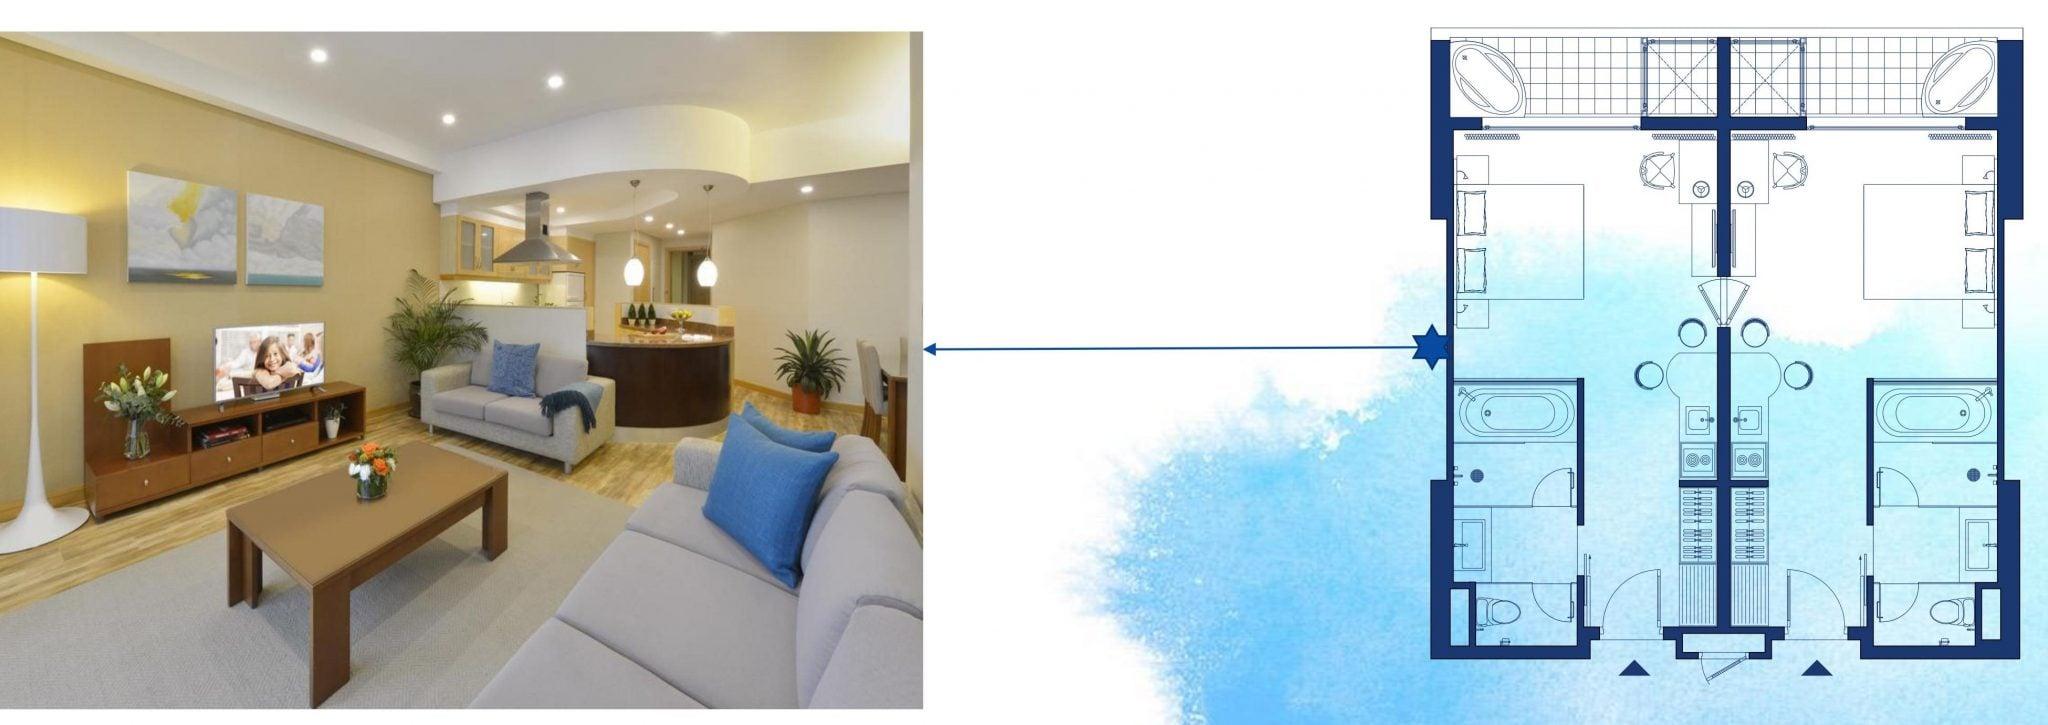 0045 e1563265585388 - Dự án căn hộ condotel Cam Ranh Bay - Pearl Cam Ranh